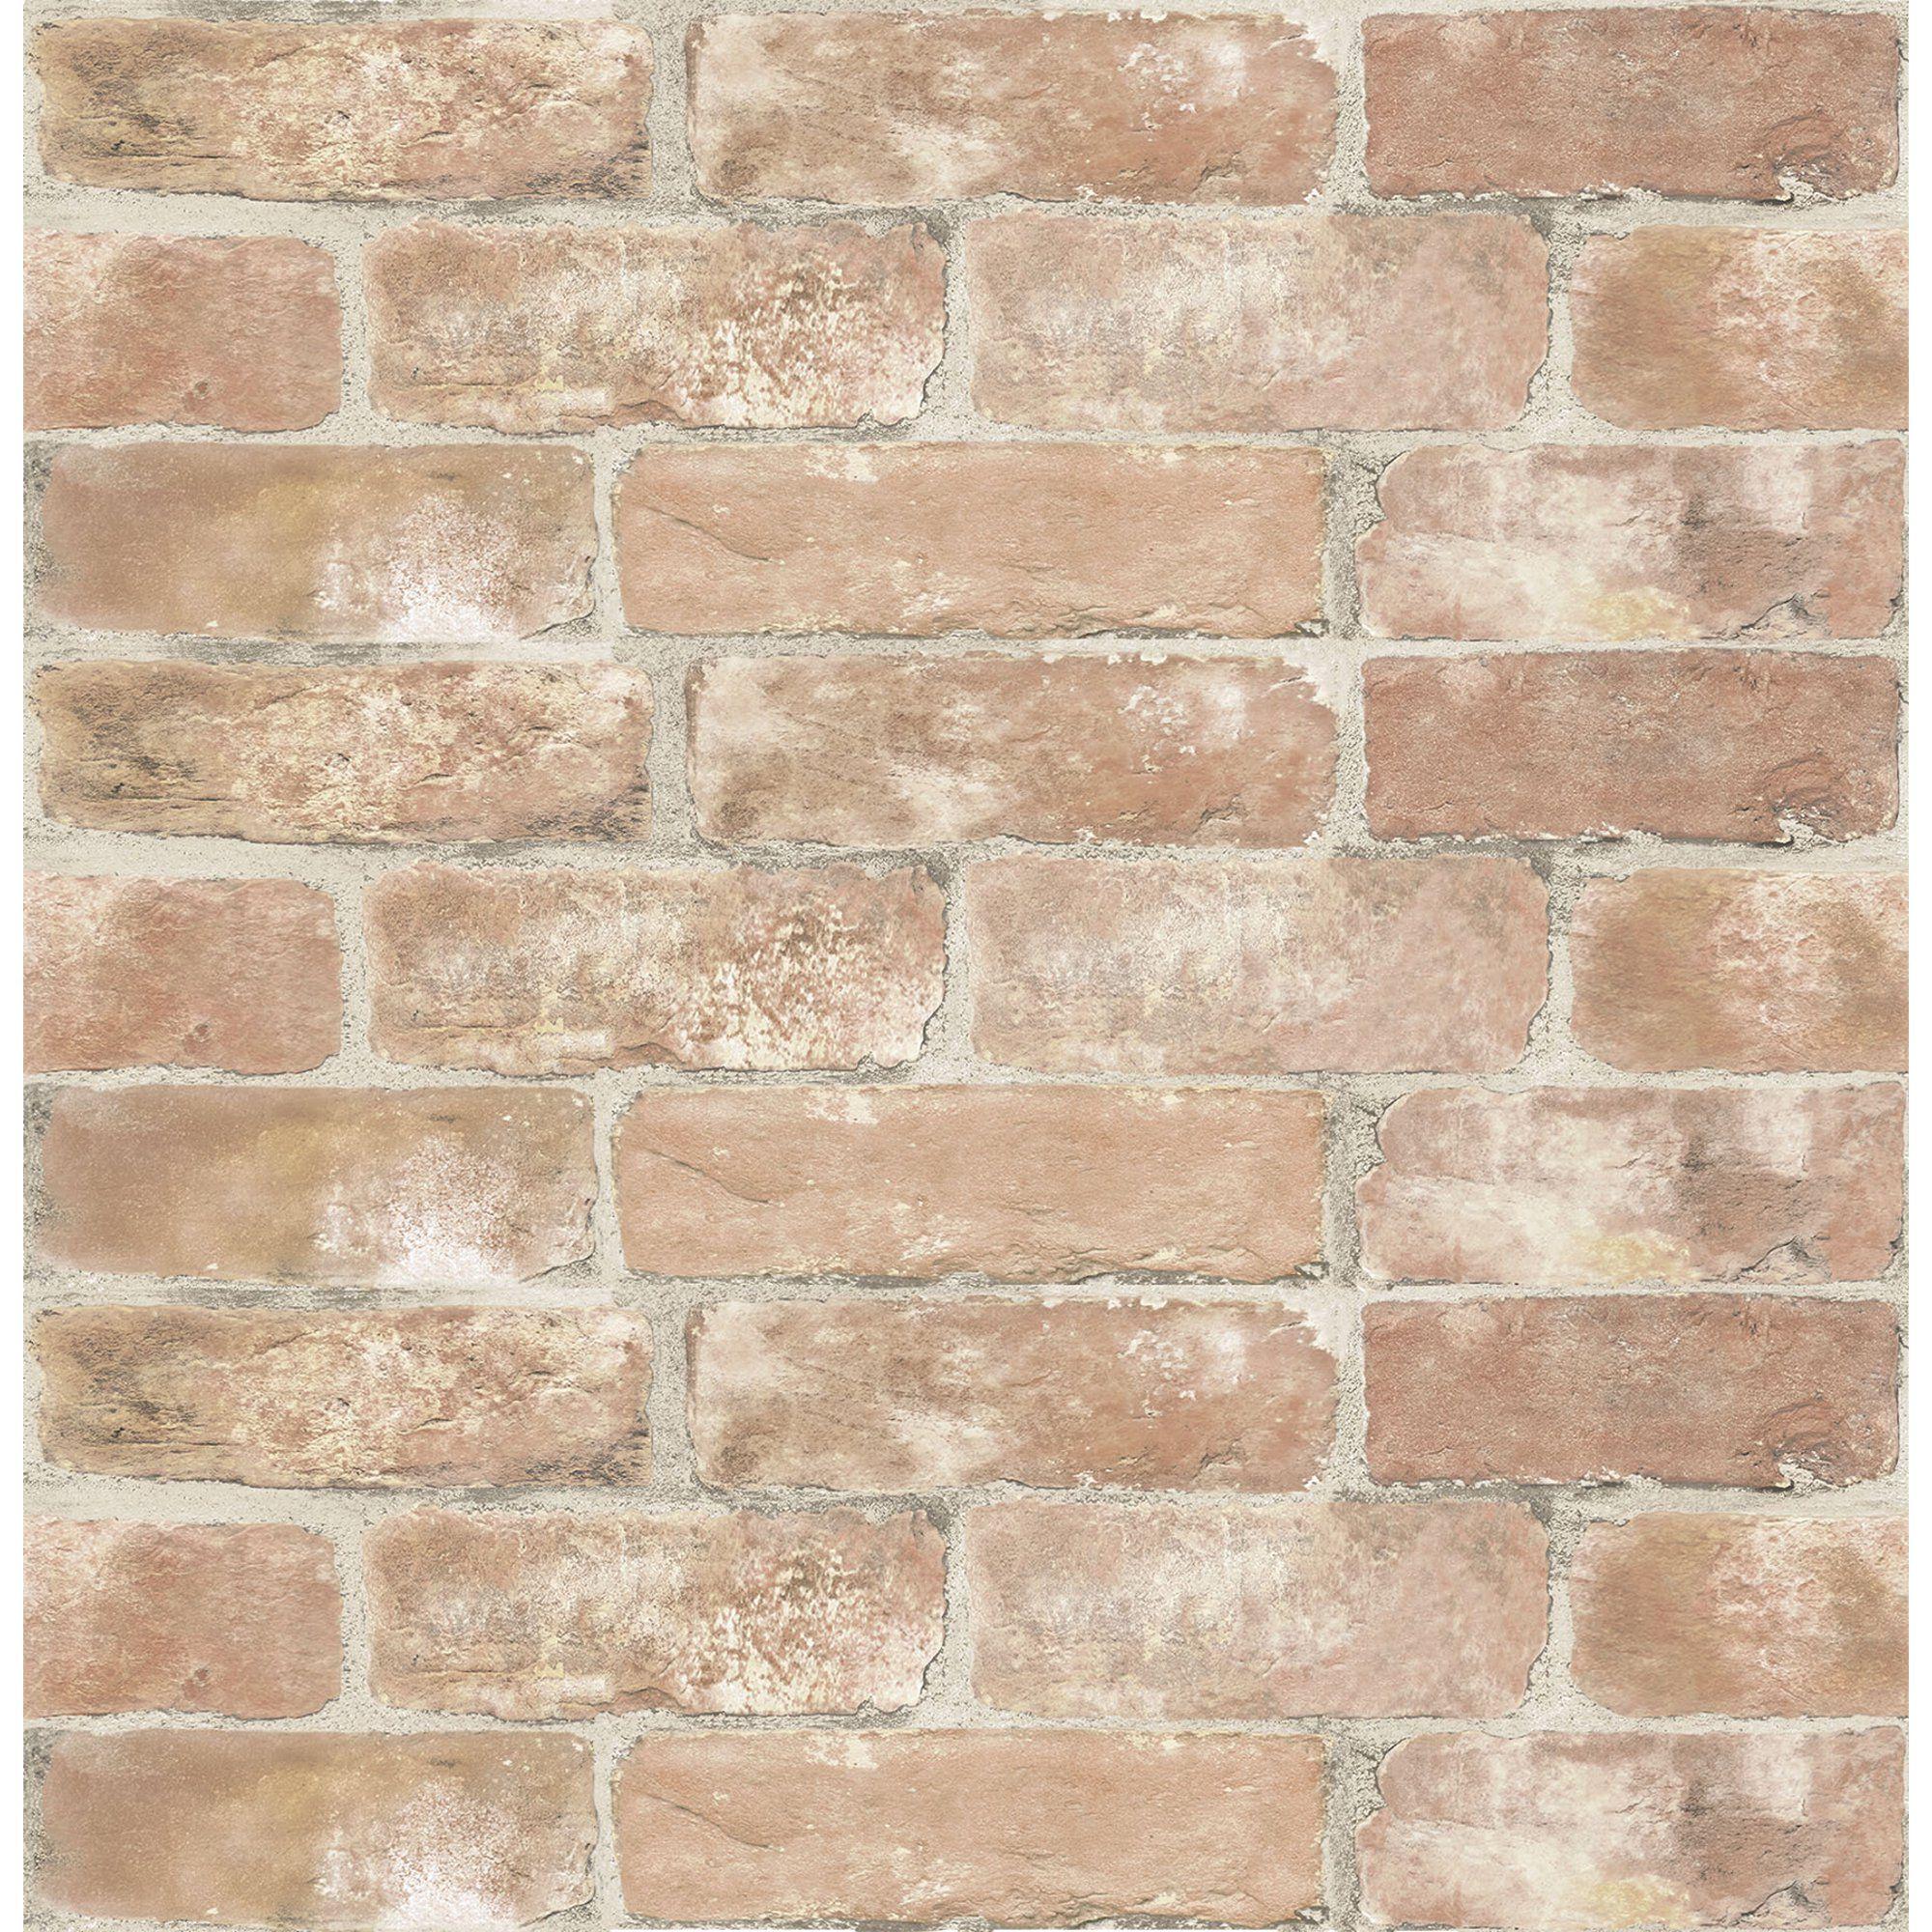 Inhome Old Town Brick Peel Stick Wallpaper Walmart Com In 2020 Peel And Stick Wallpaper Brick Wallpaper Red Brick Wallpaper